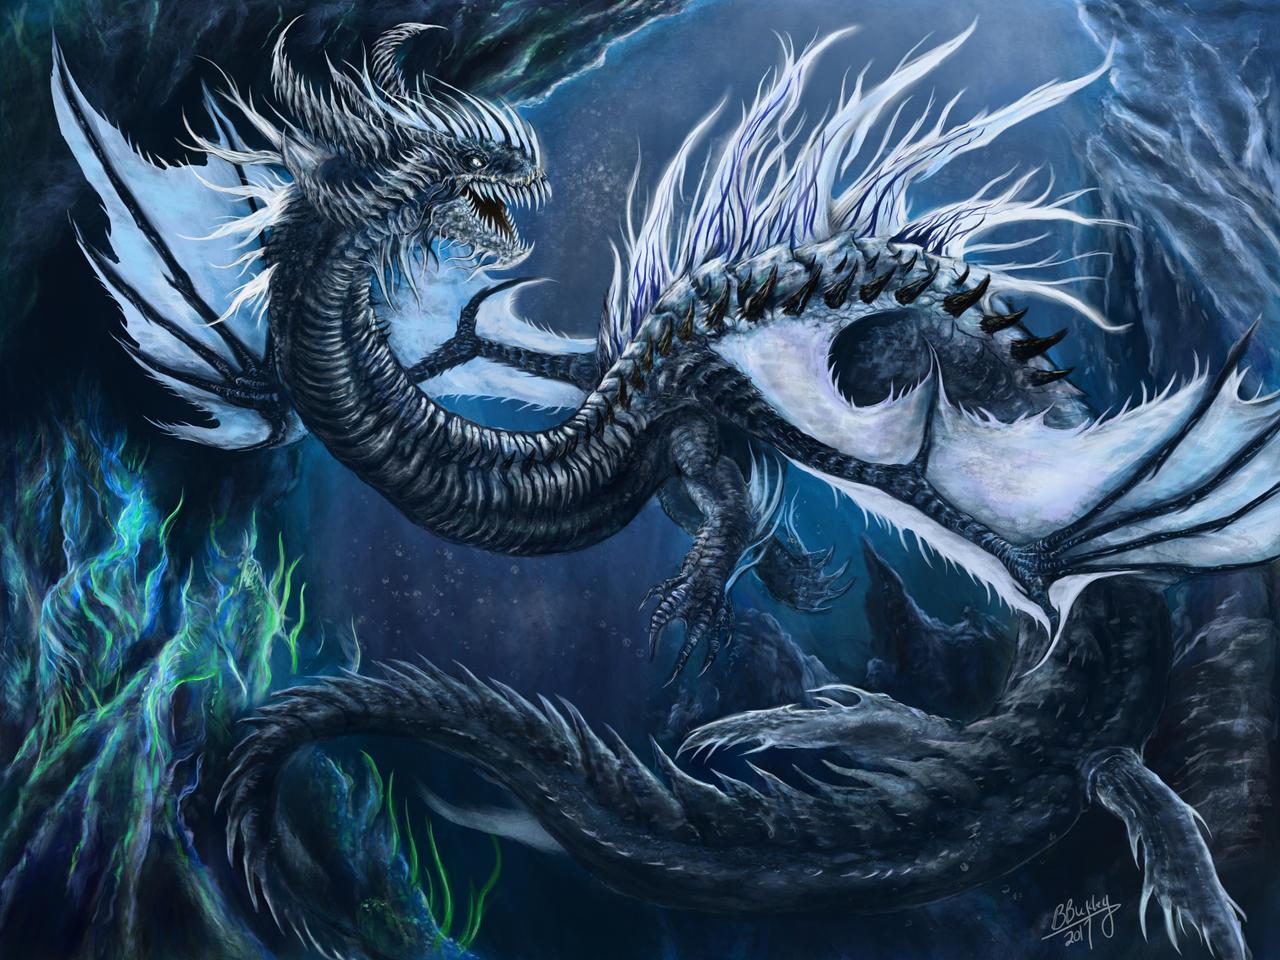 Deep Sea Leviathan by WretchedSpawn2012 on DeviantArt